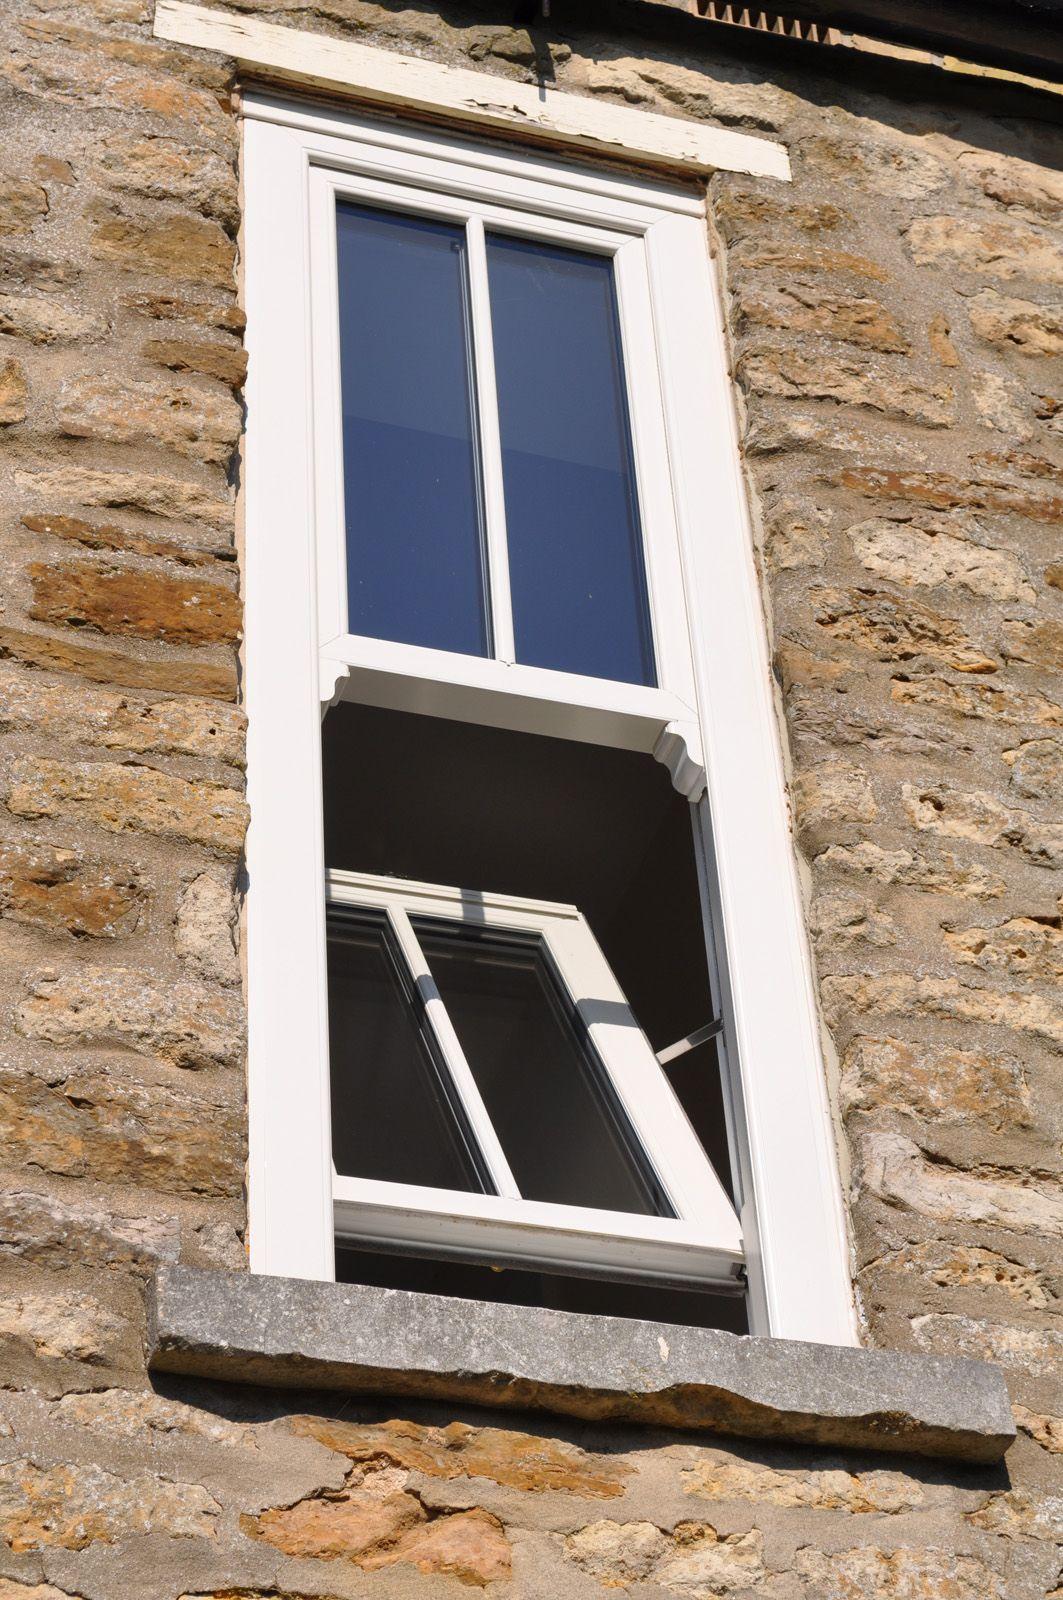 Vertical Sliding Windows Windows, Sliding windows, Vertical